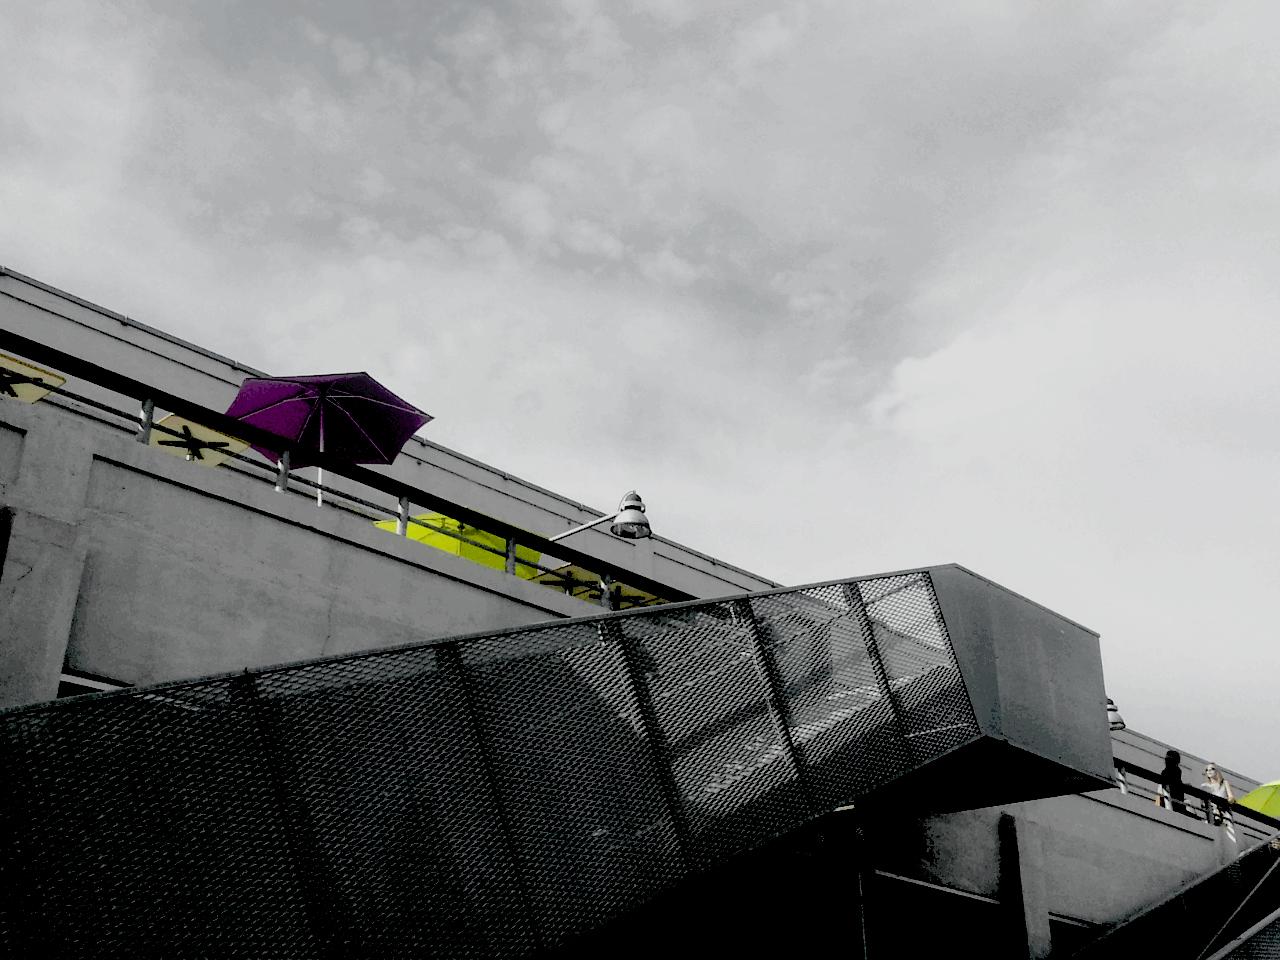 Le Hangar 14 /1